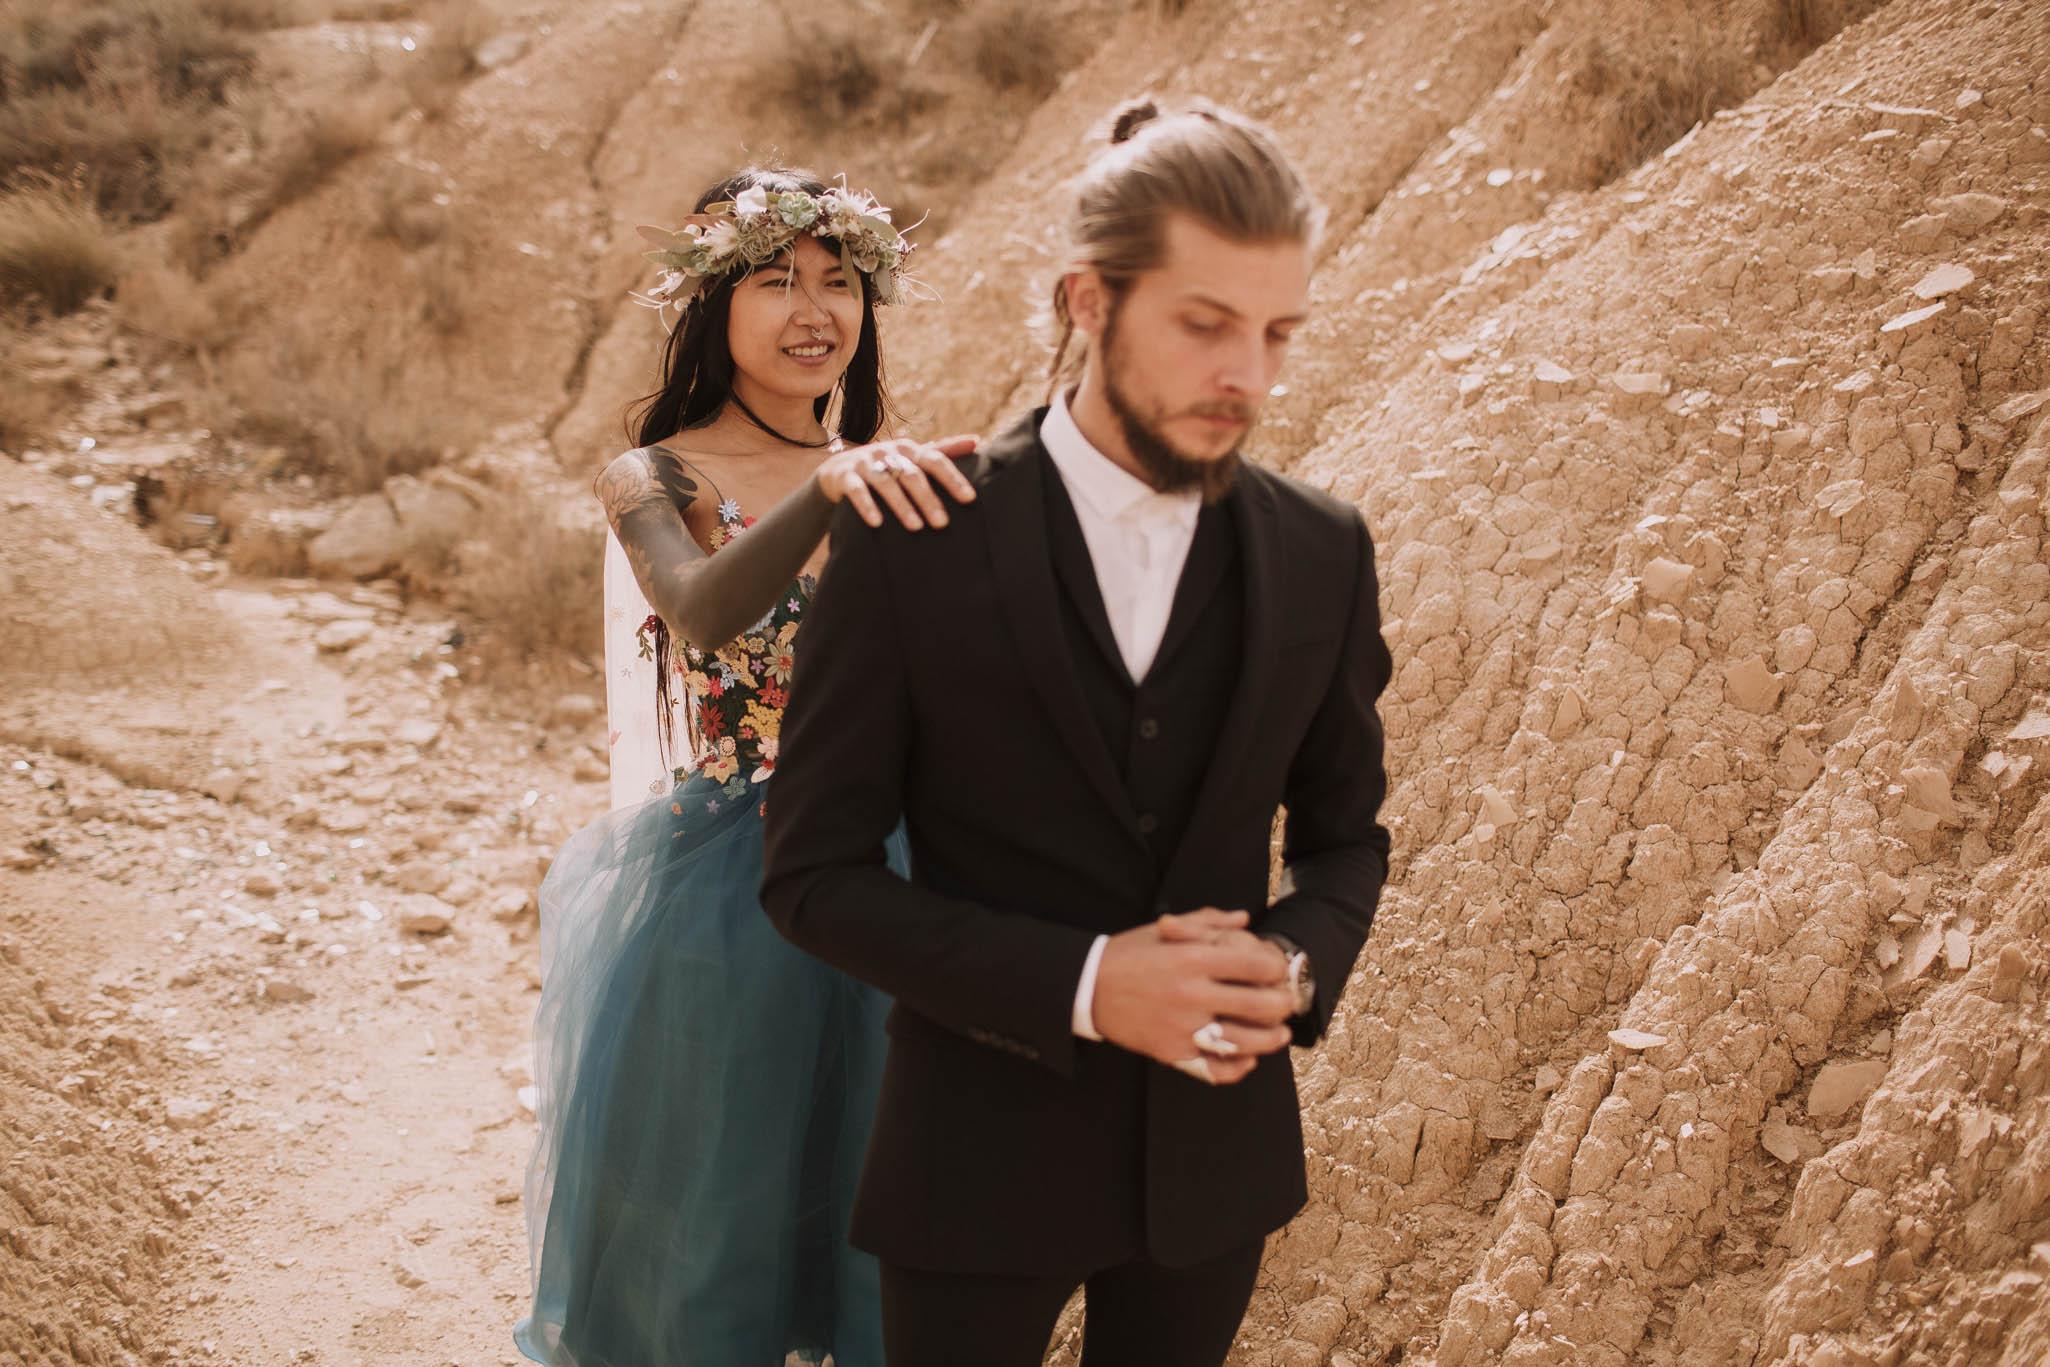 Spain-wedding-photographer-bardenas-reales-jeremy-boyer-photographe-mariage-bordeaux-floral-wedding-dress-robe-76.jpg